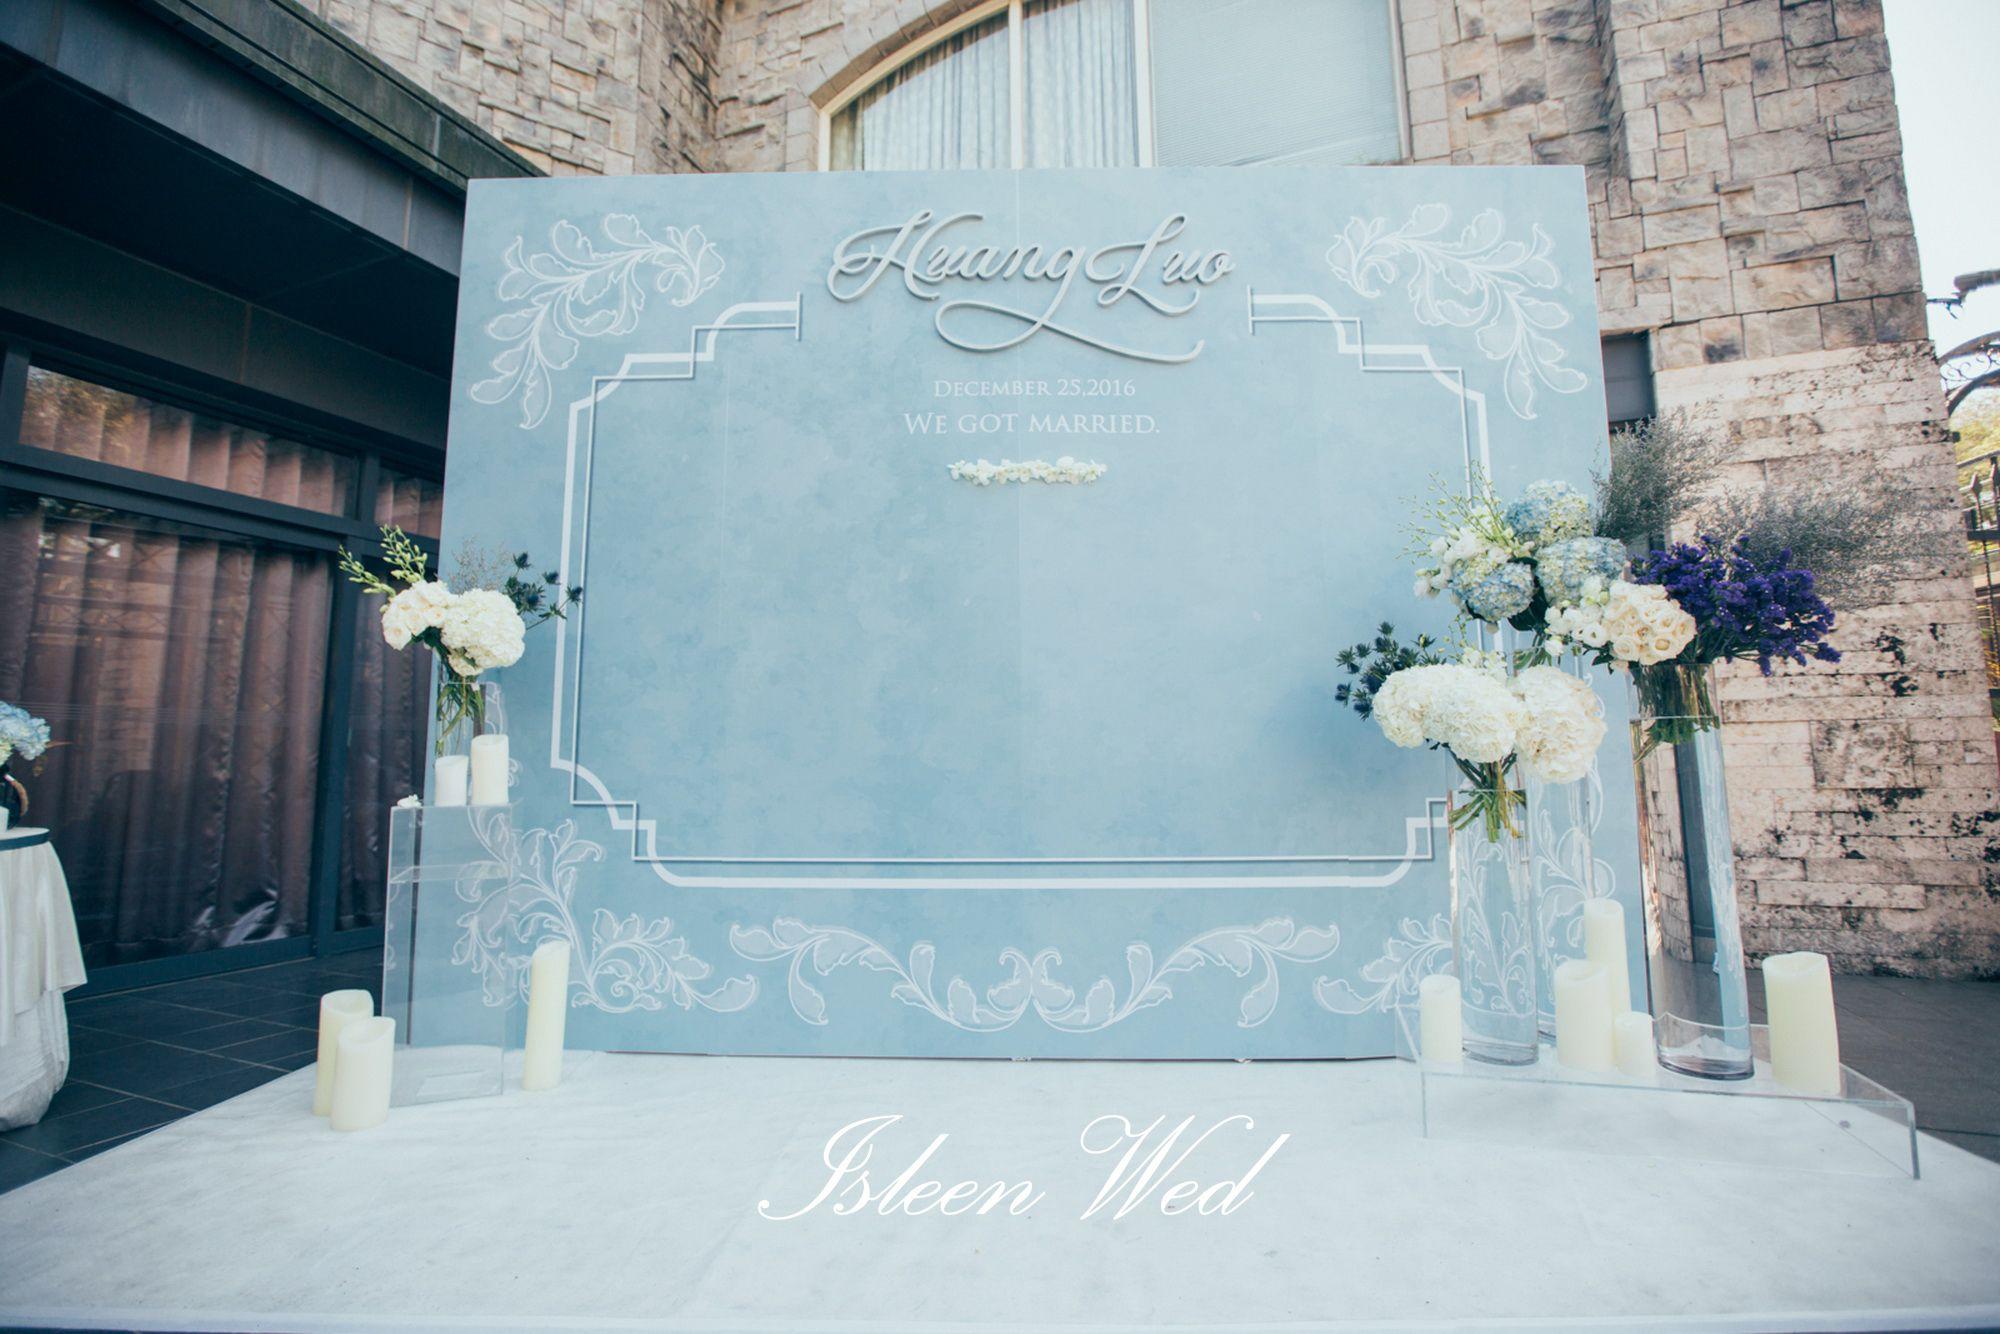 Wedding decoration designs  愛絲琳創意婚禮 一站式完美婚禮 isleenwed isleenwed Floral design